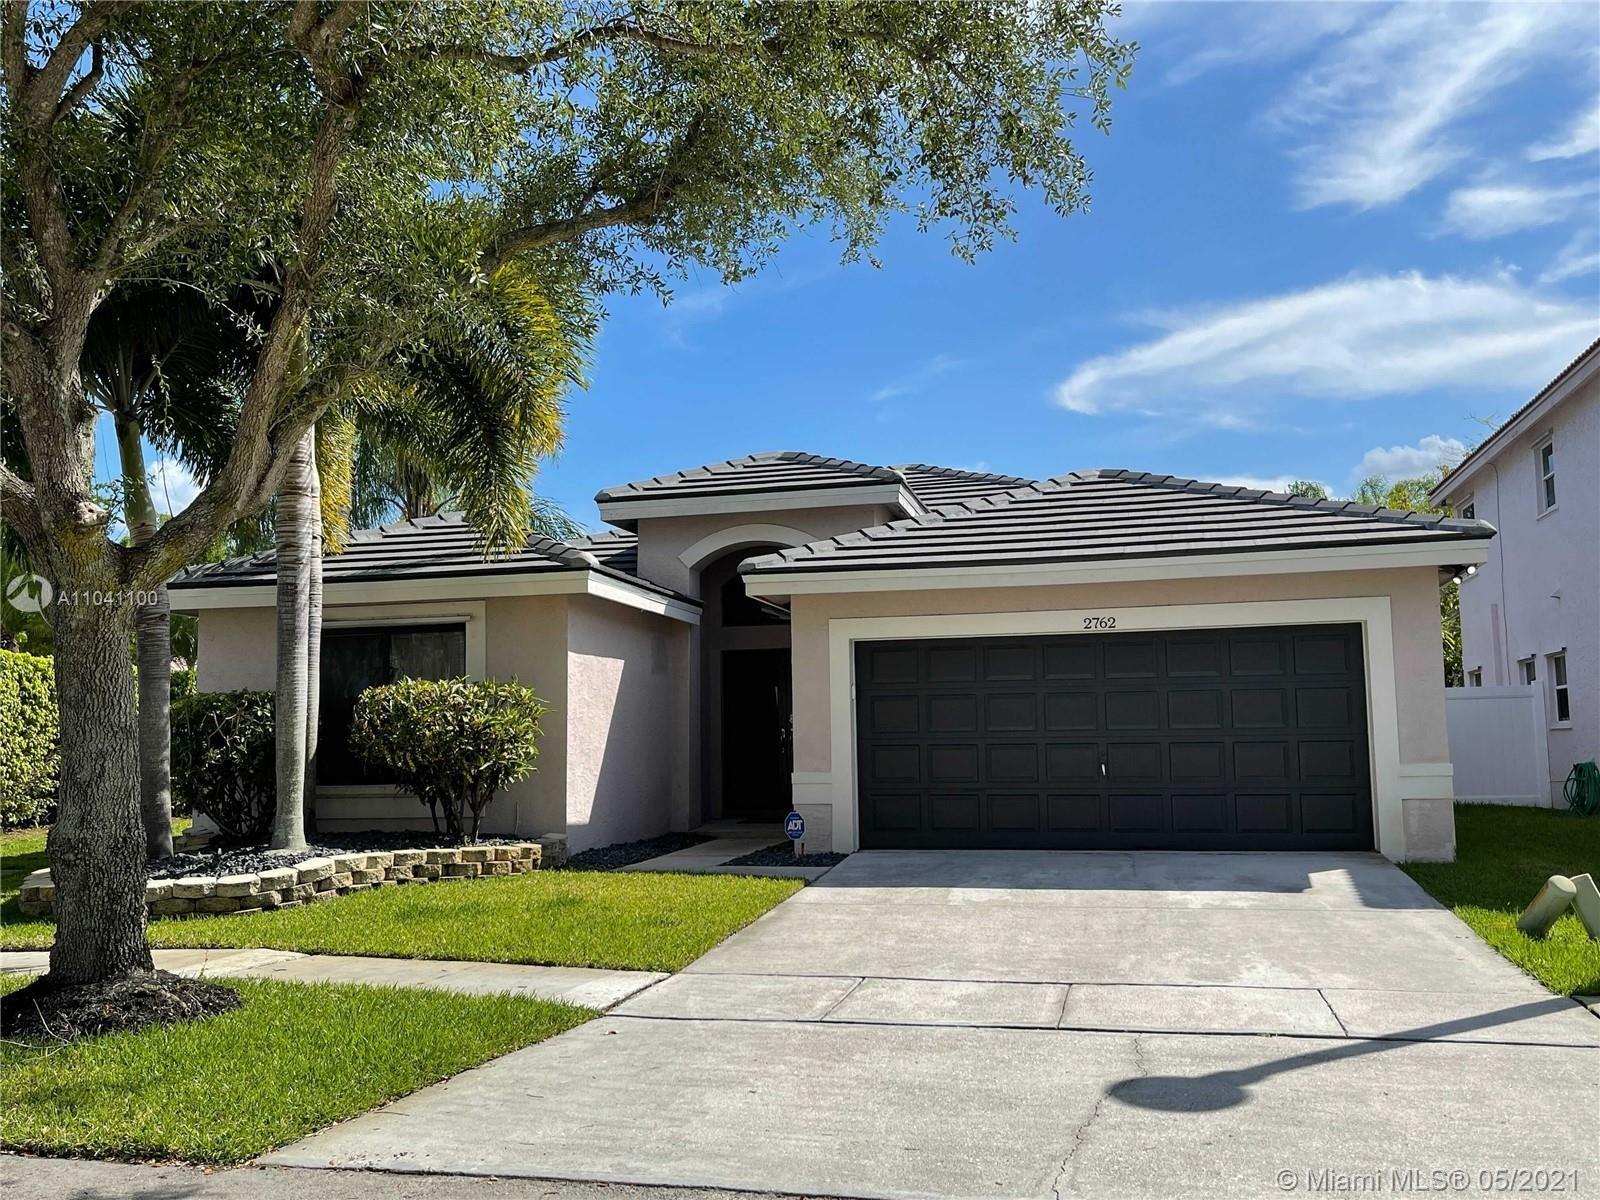 Photo of 2762 SW 179th Ave, Miramar, FL 33029 (MLS # A11041100)